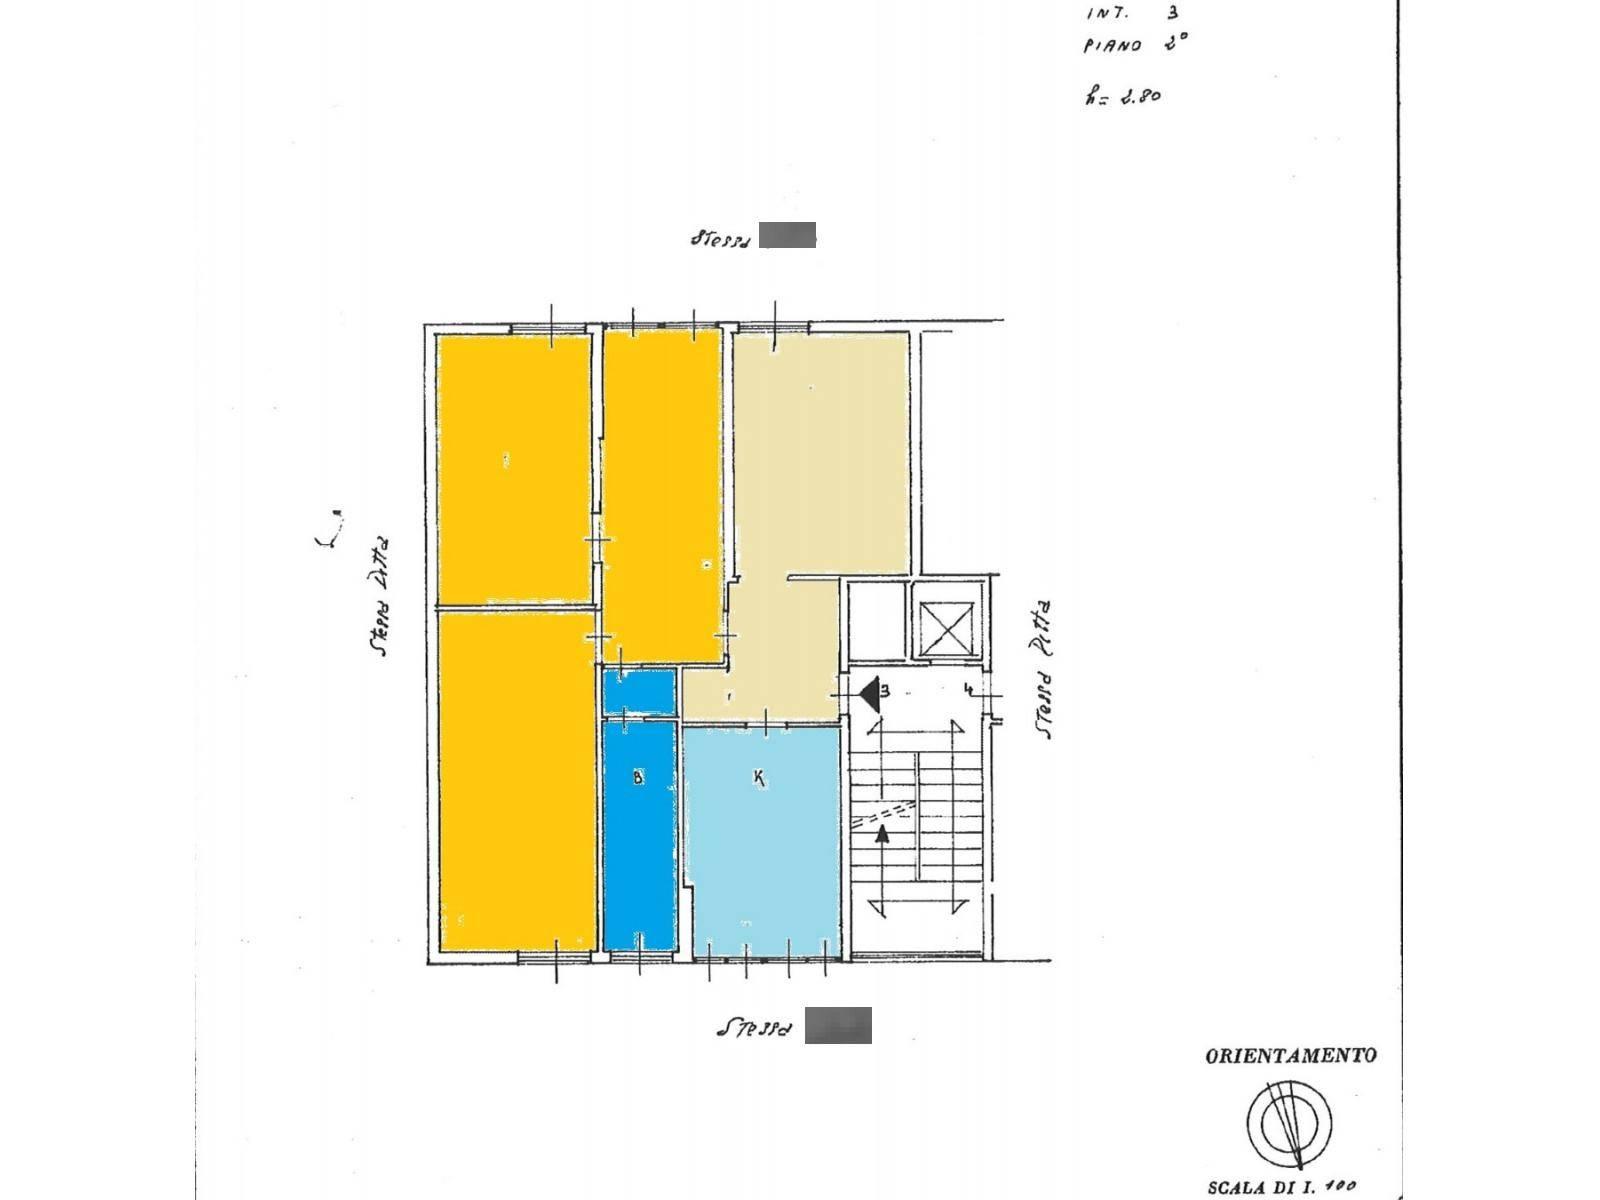 1118420727 Quadrilocale in Viale Di Torre Maura, Roma, Zona Torre Maura